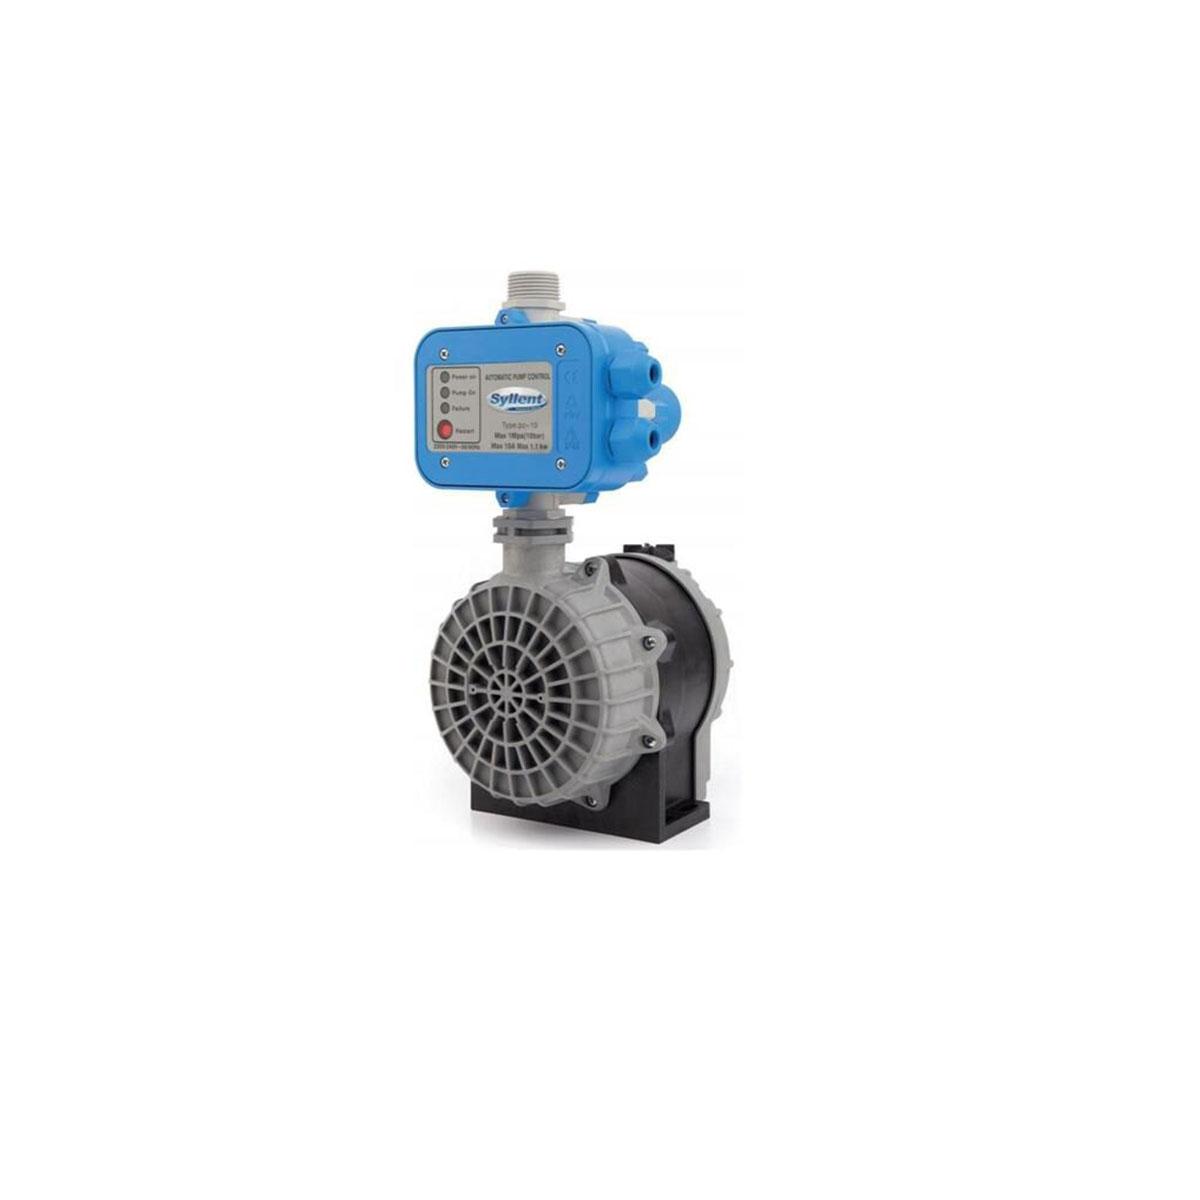 Bomba Pressurizadora 1 CV c/ Pressostato 110v MB71E0006AP/PREL5 Syllent